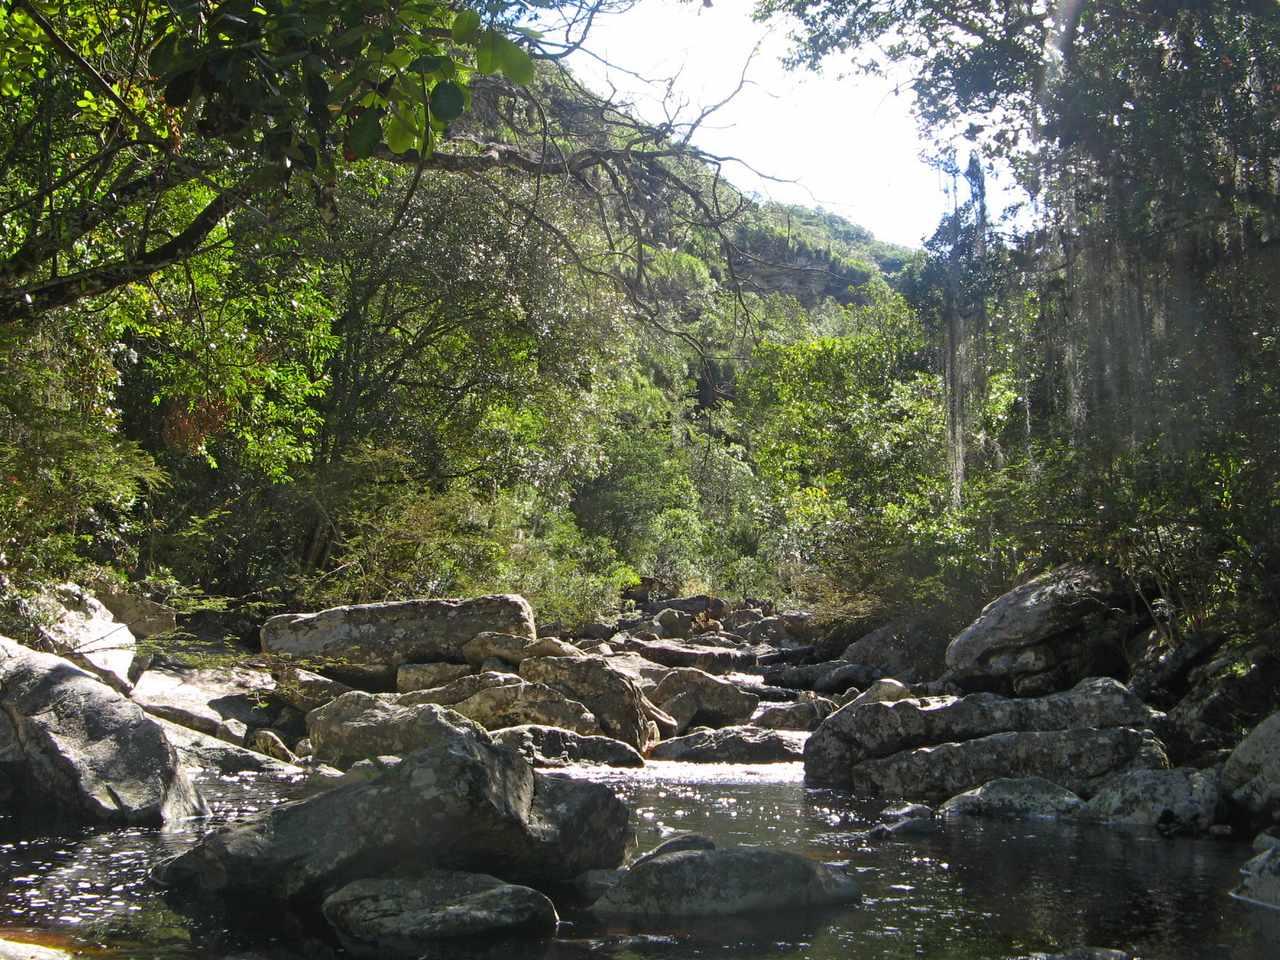 Trilha Cachoeira da Mixila, Canyon, Chapada Diamntina, Bahia, Brazil (1)